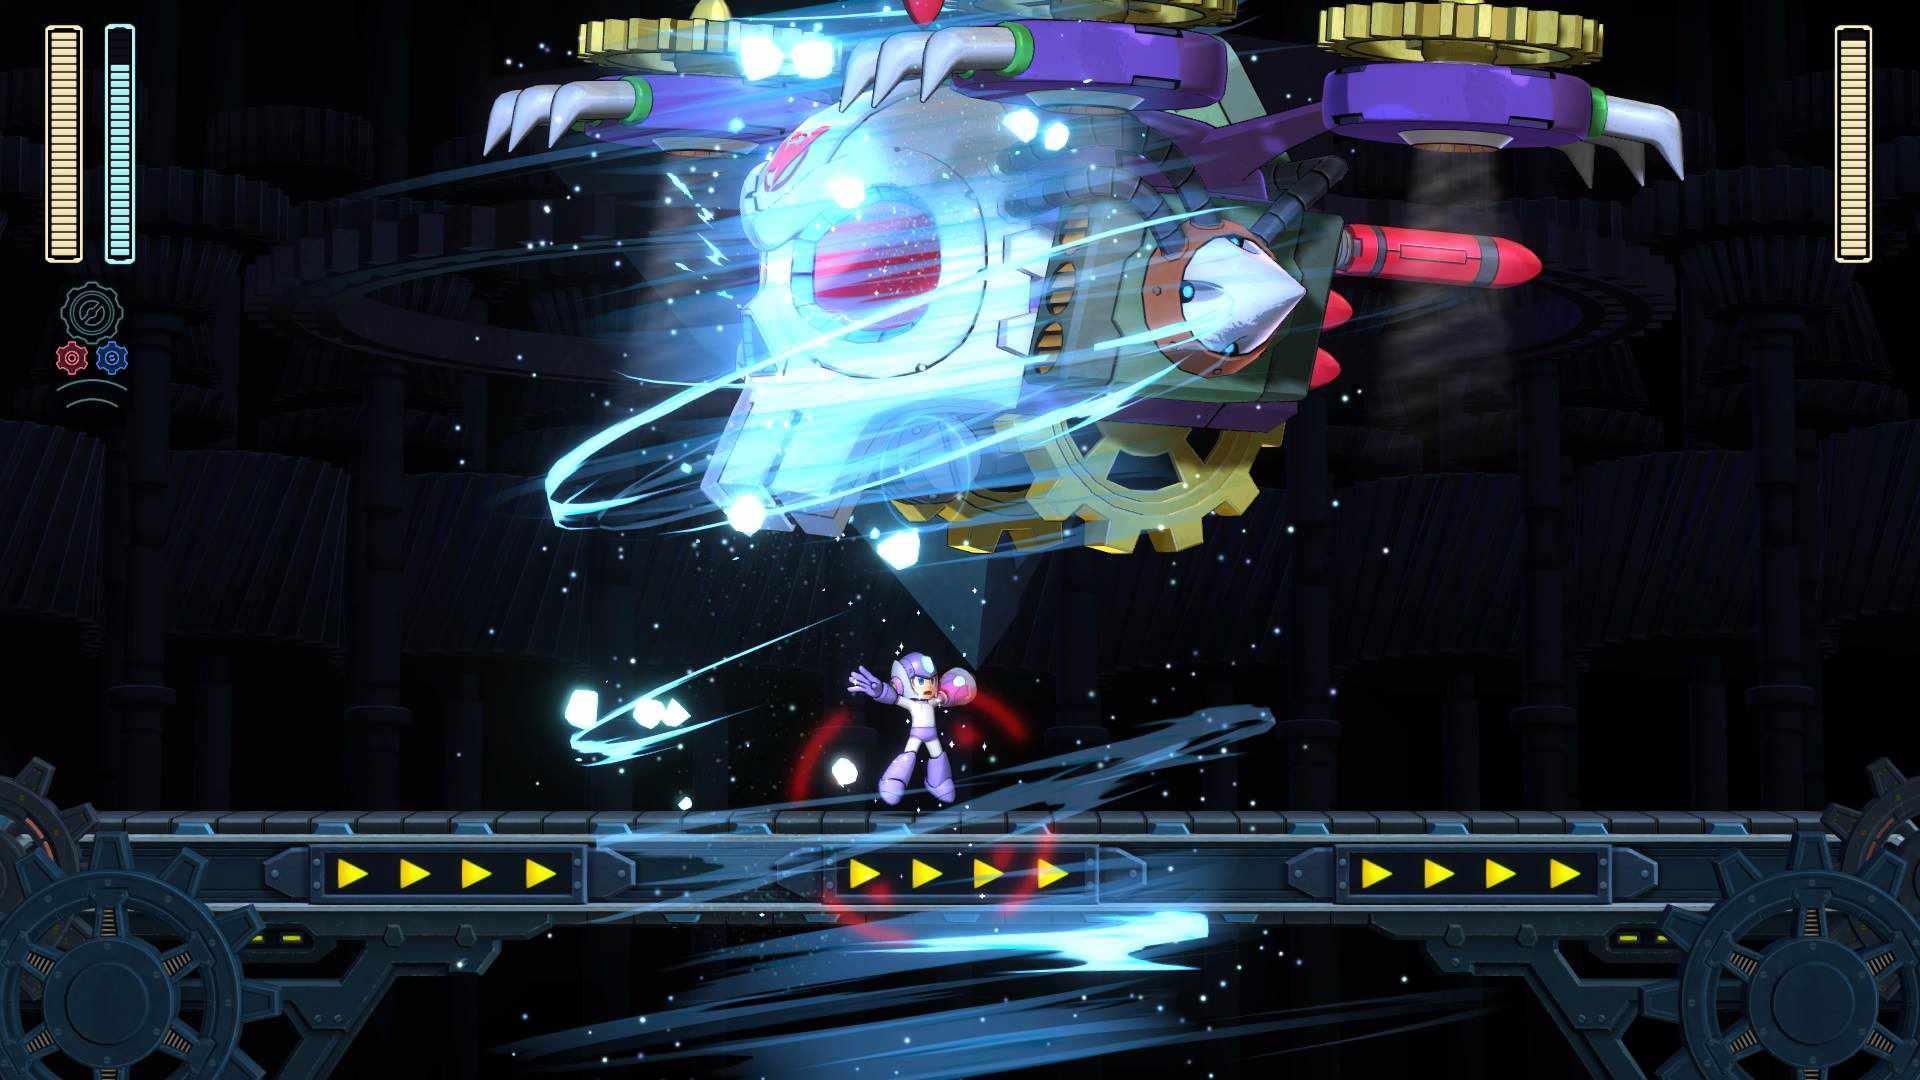 Mega Man attacks Dr. Wily in Mega Man 11